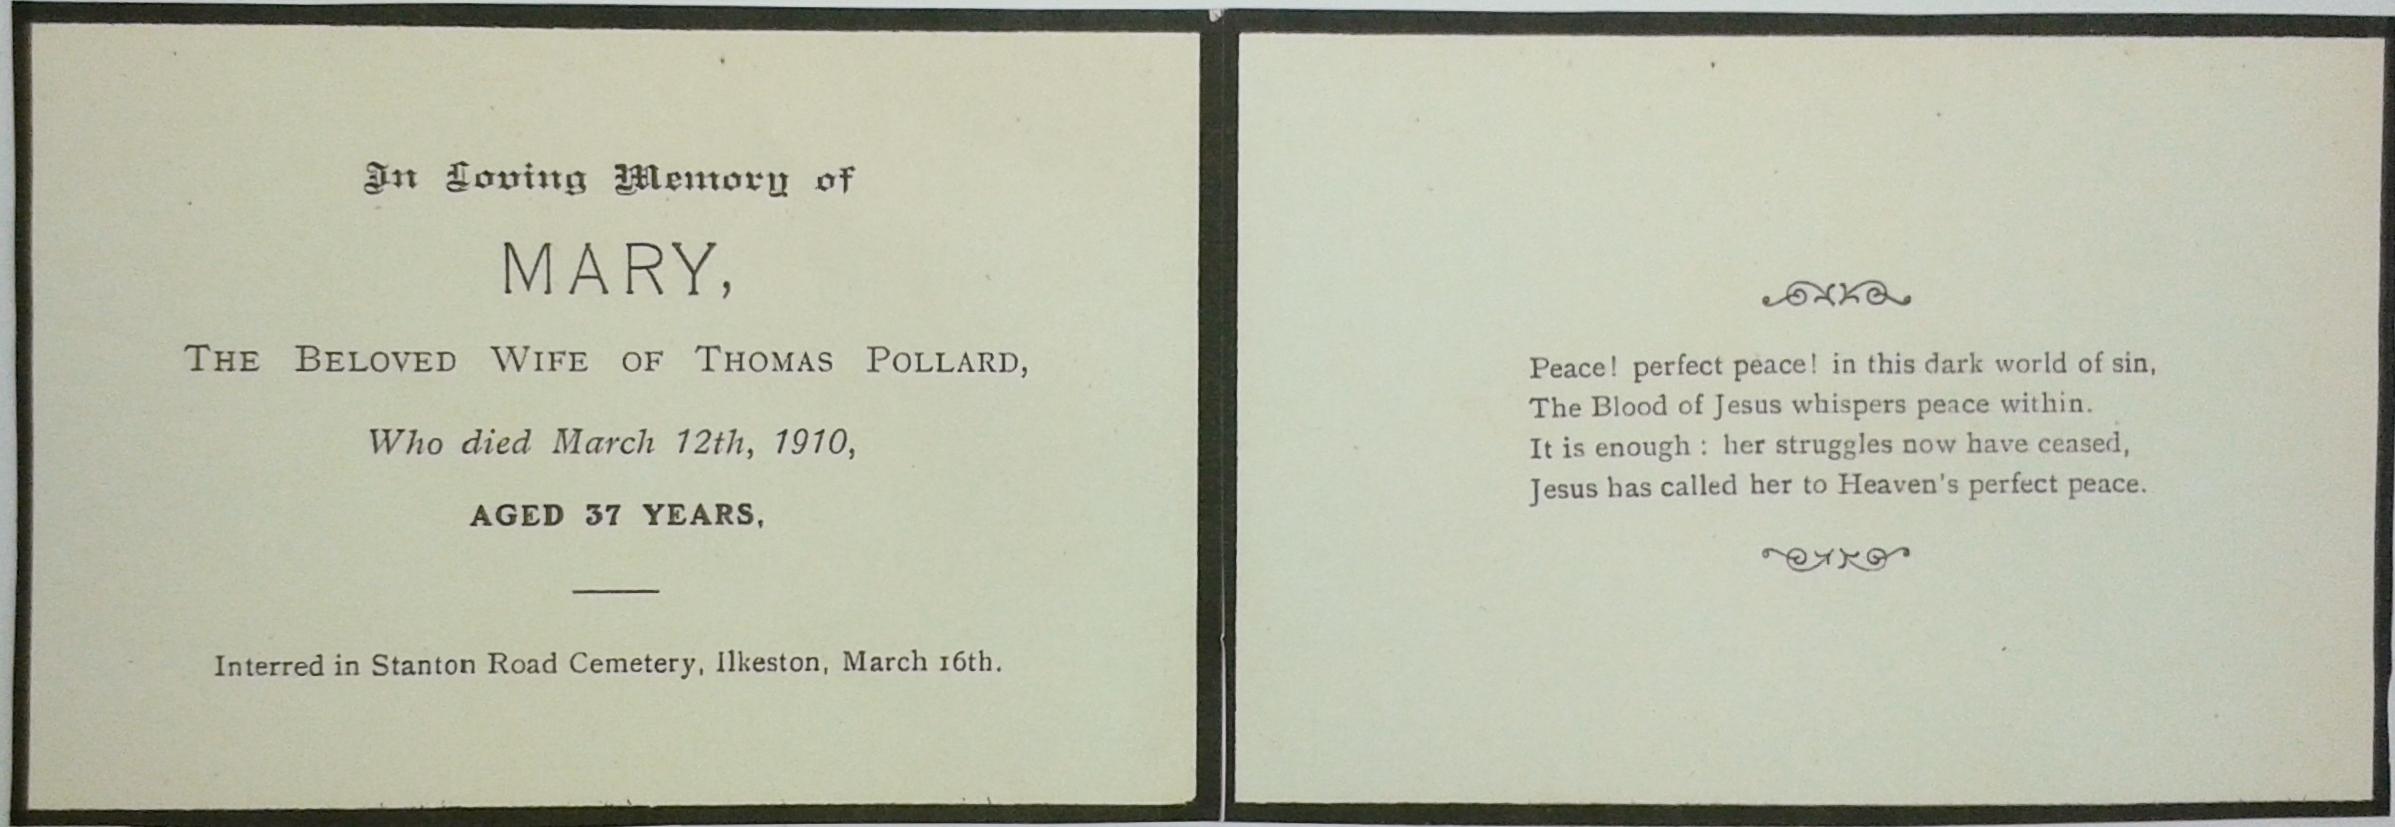 Mary Pollard card 7